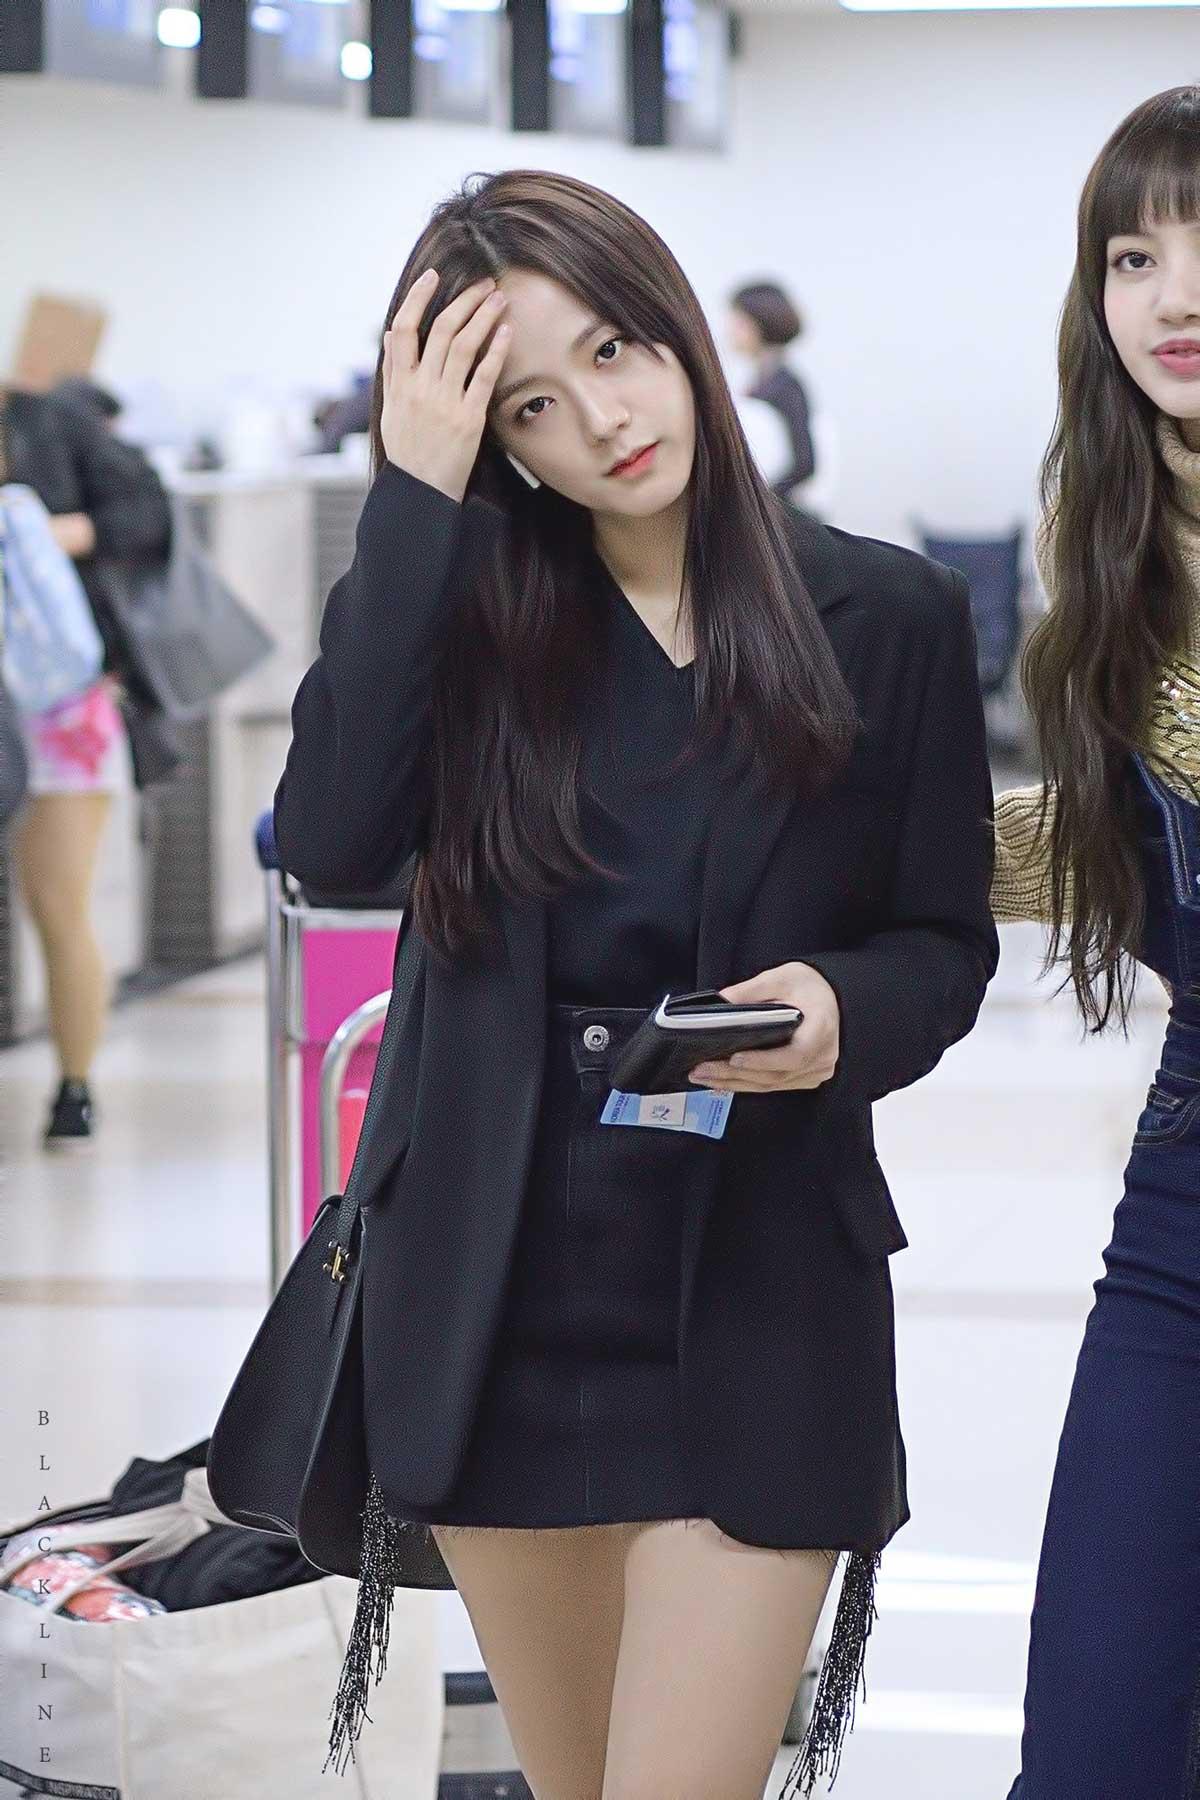 Blackpink Jisoo Airport Fashion 27 March 2018